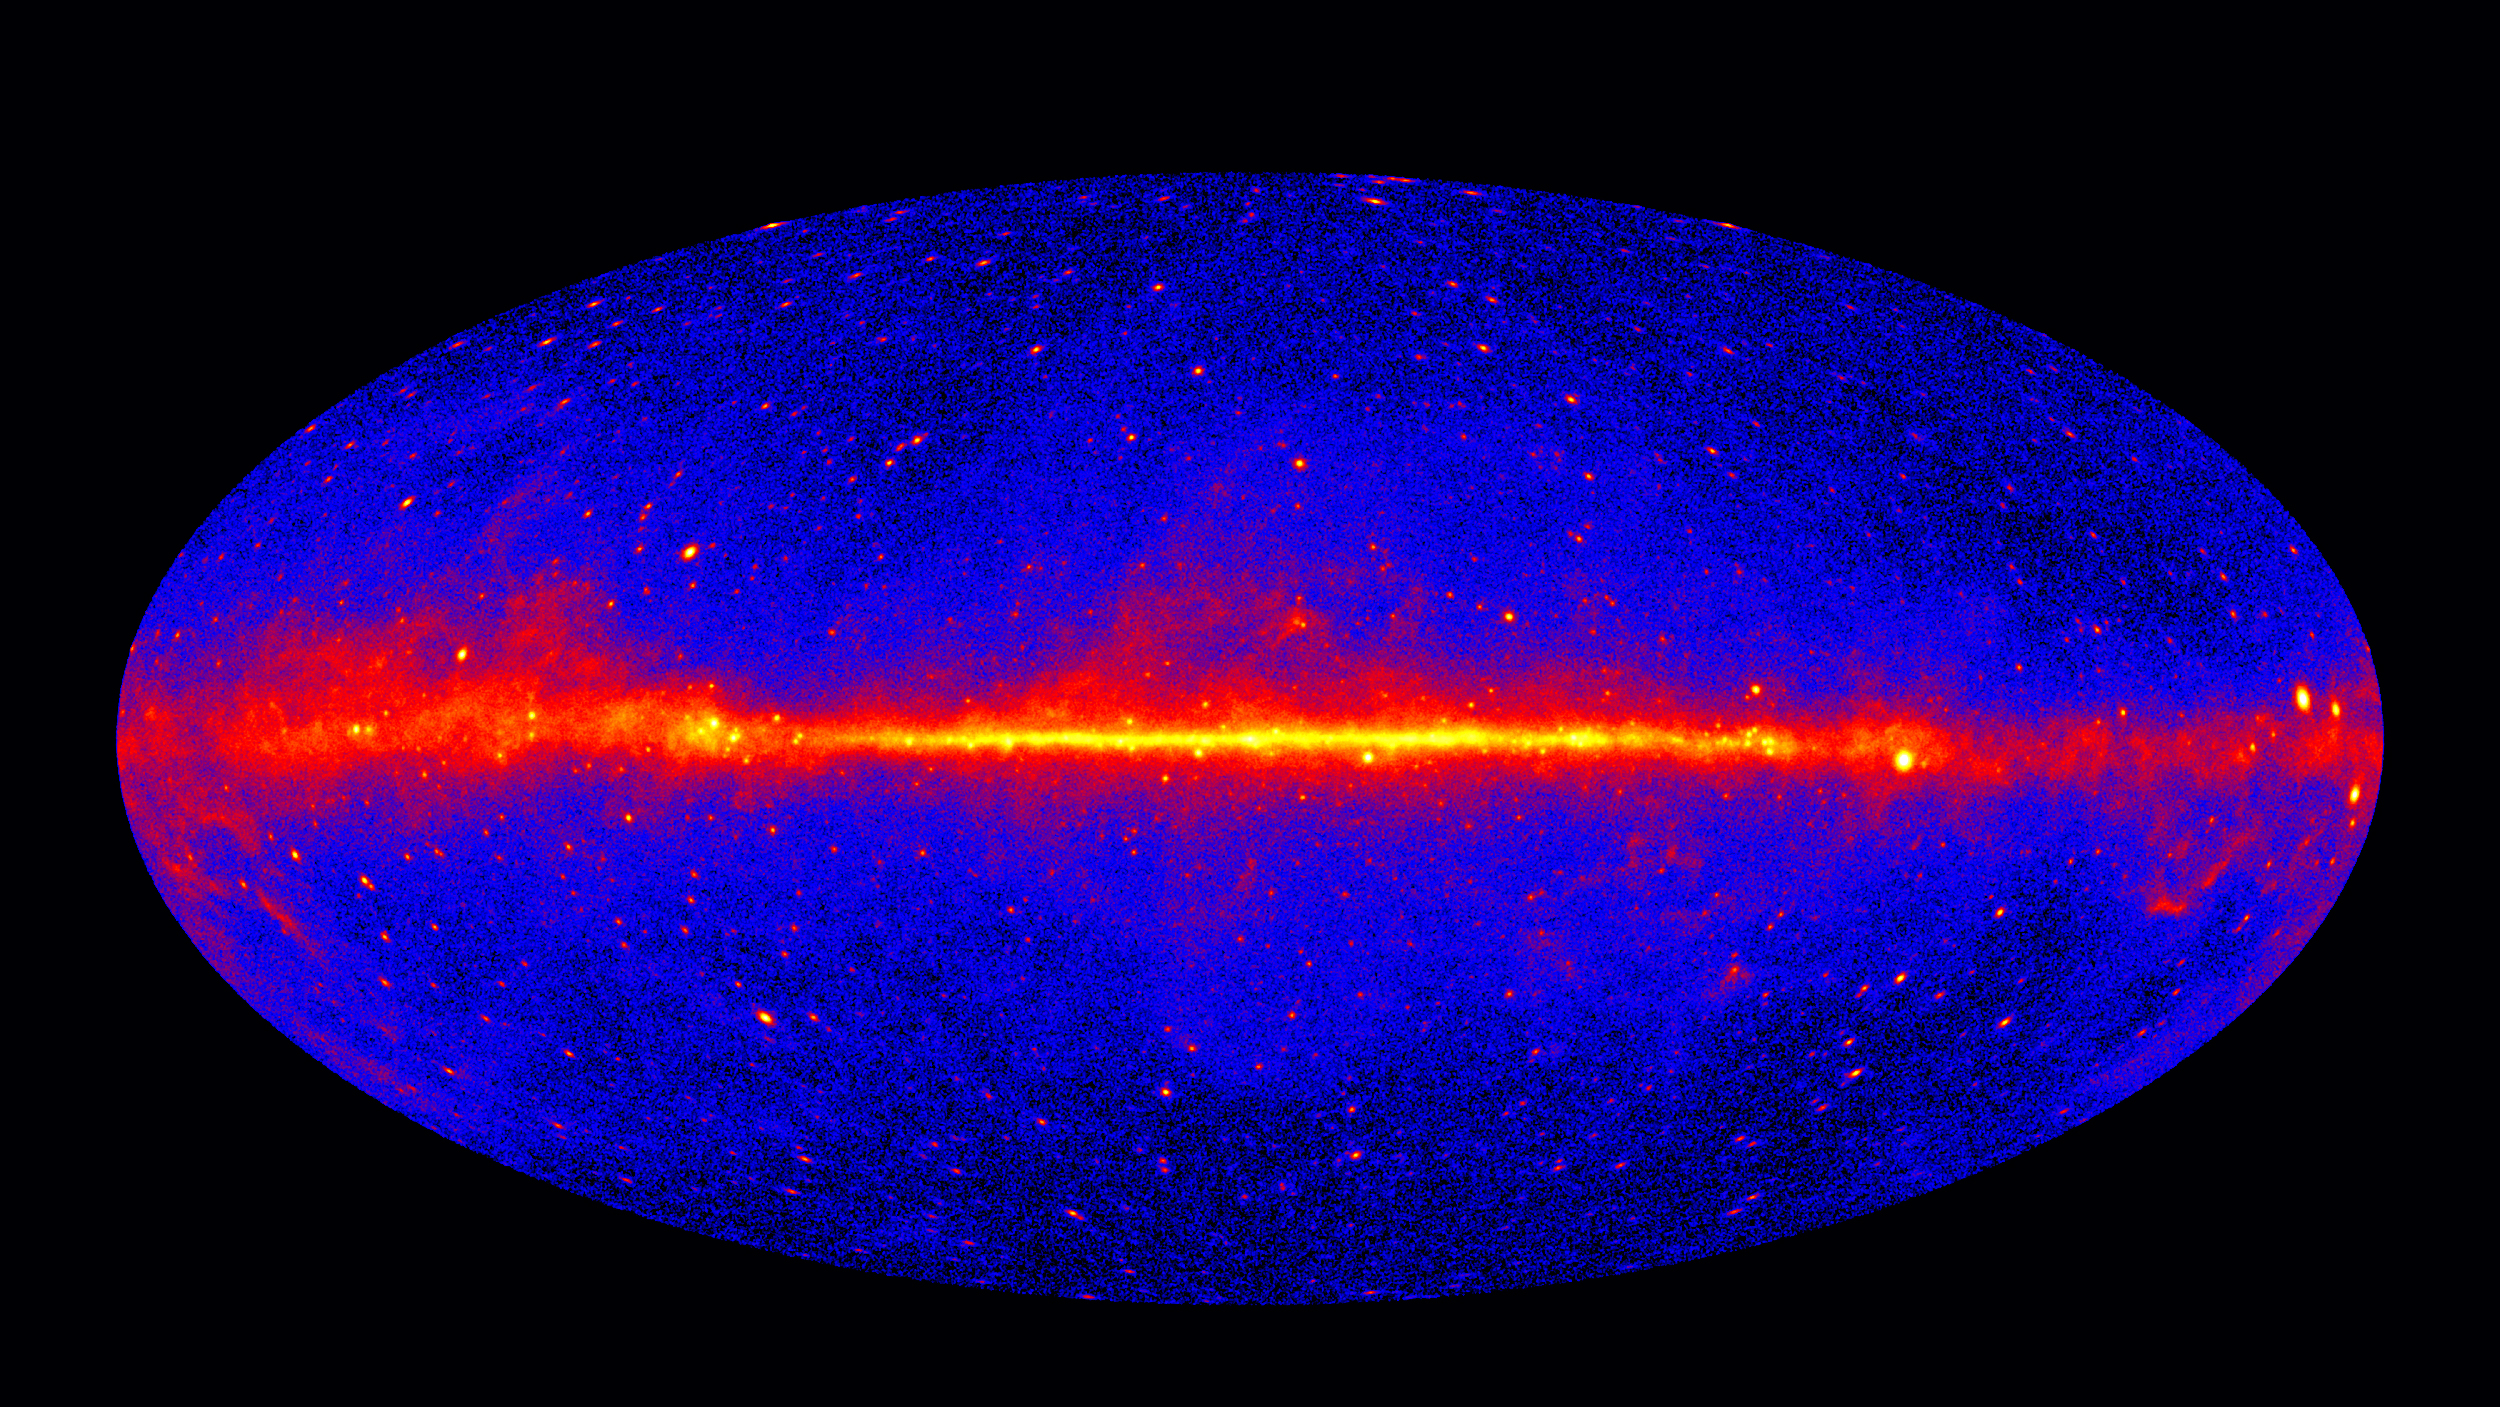 NASA Extends Life of Gamma-Ray Hunting Fermi Space Telescope